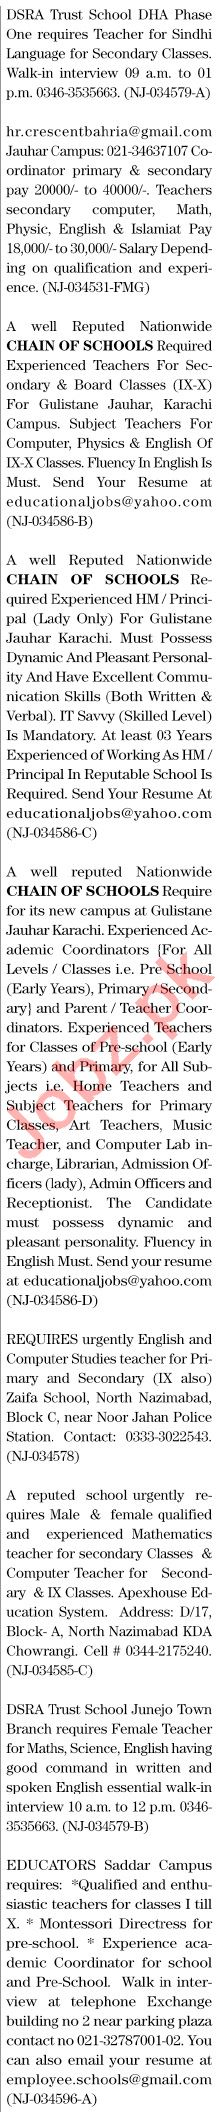 The News Sunday Classified Ads 21st Feb 2021 for Teachers